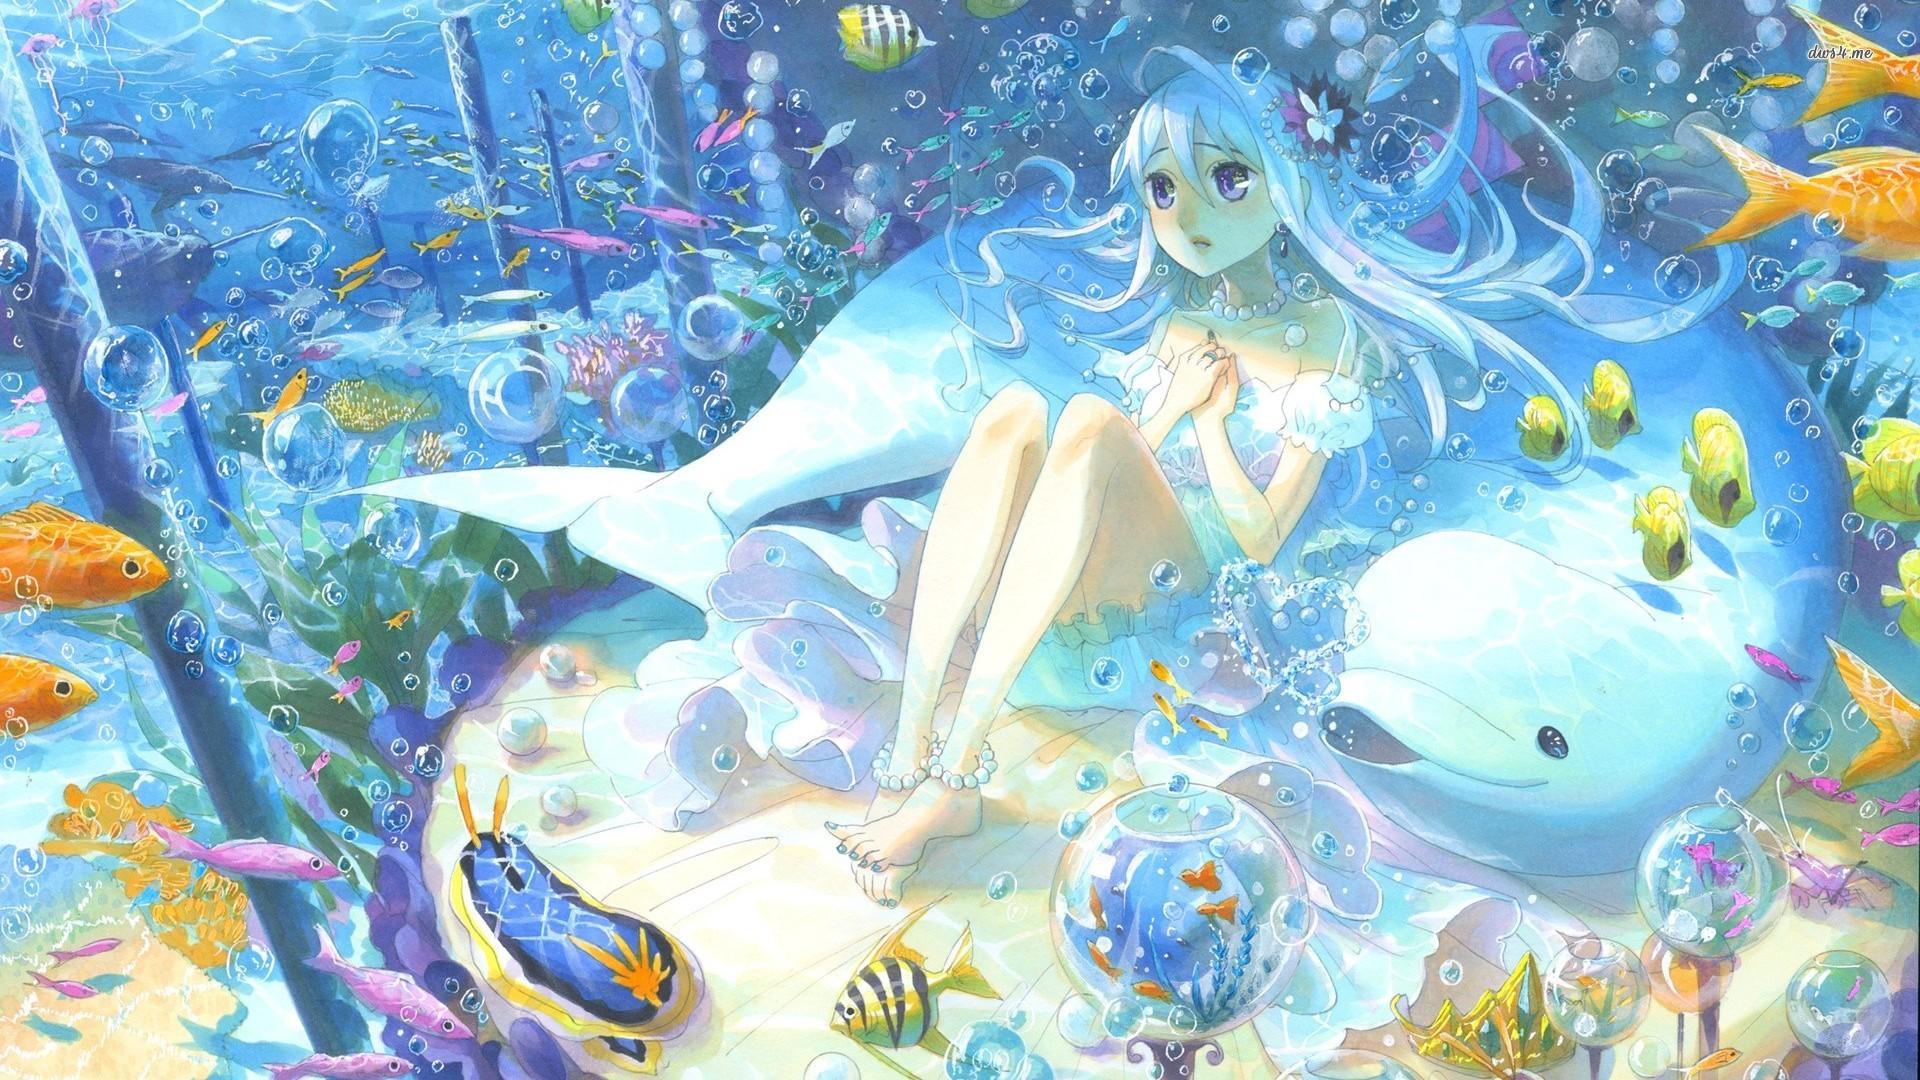 Panda Anime Wallpaper HD 9634 – Amazing Wallpaperz